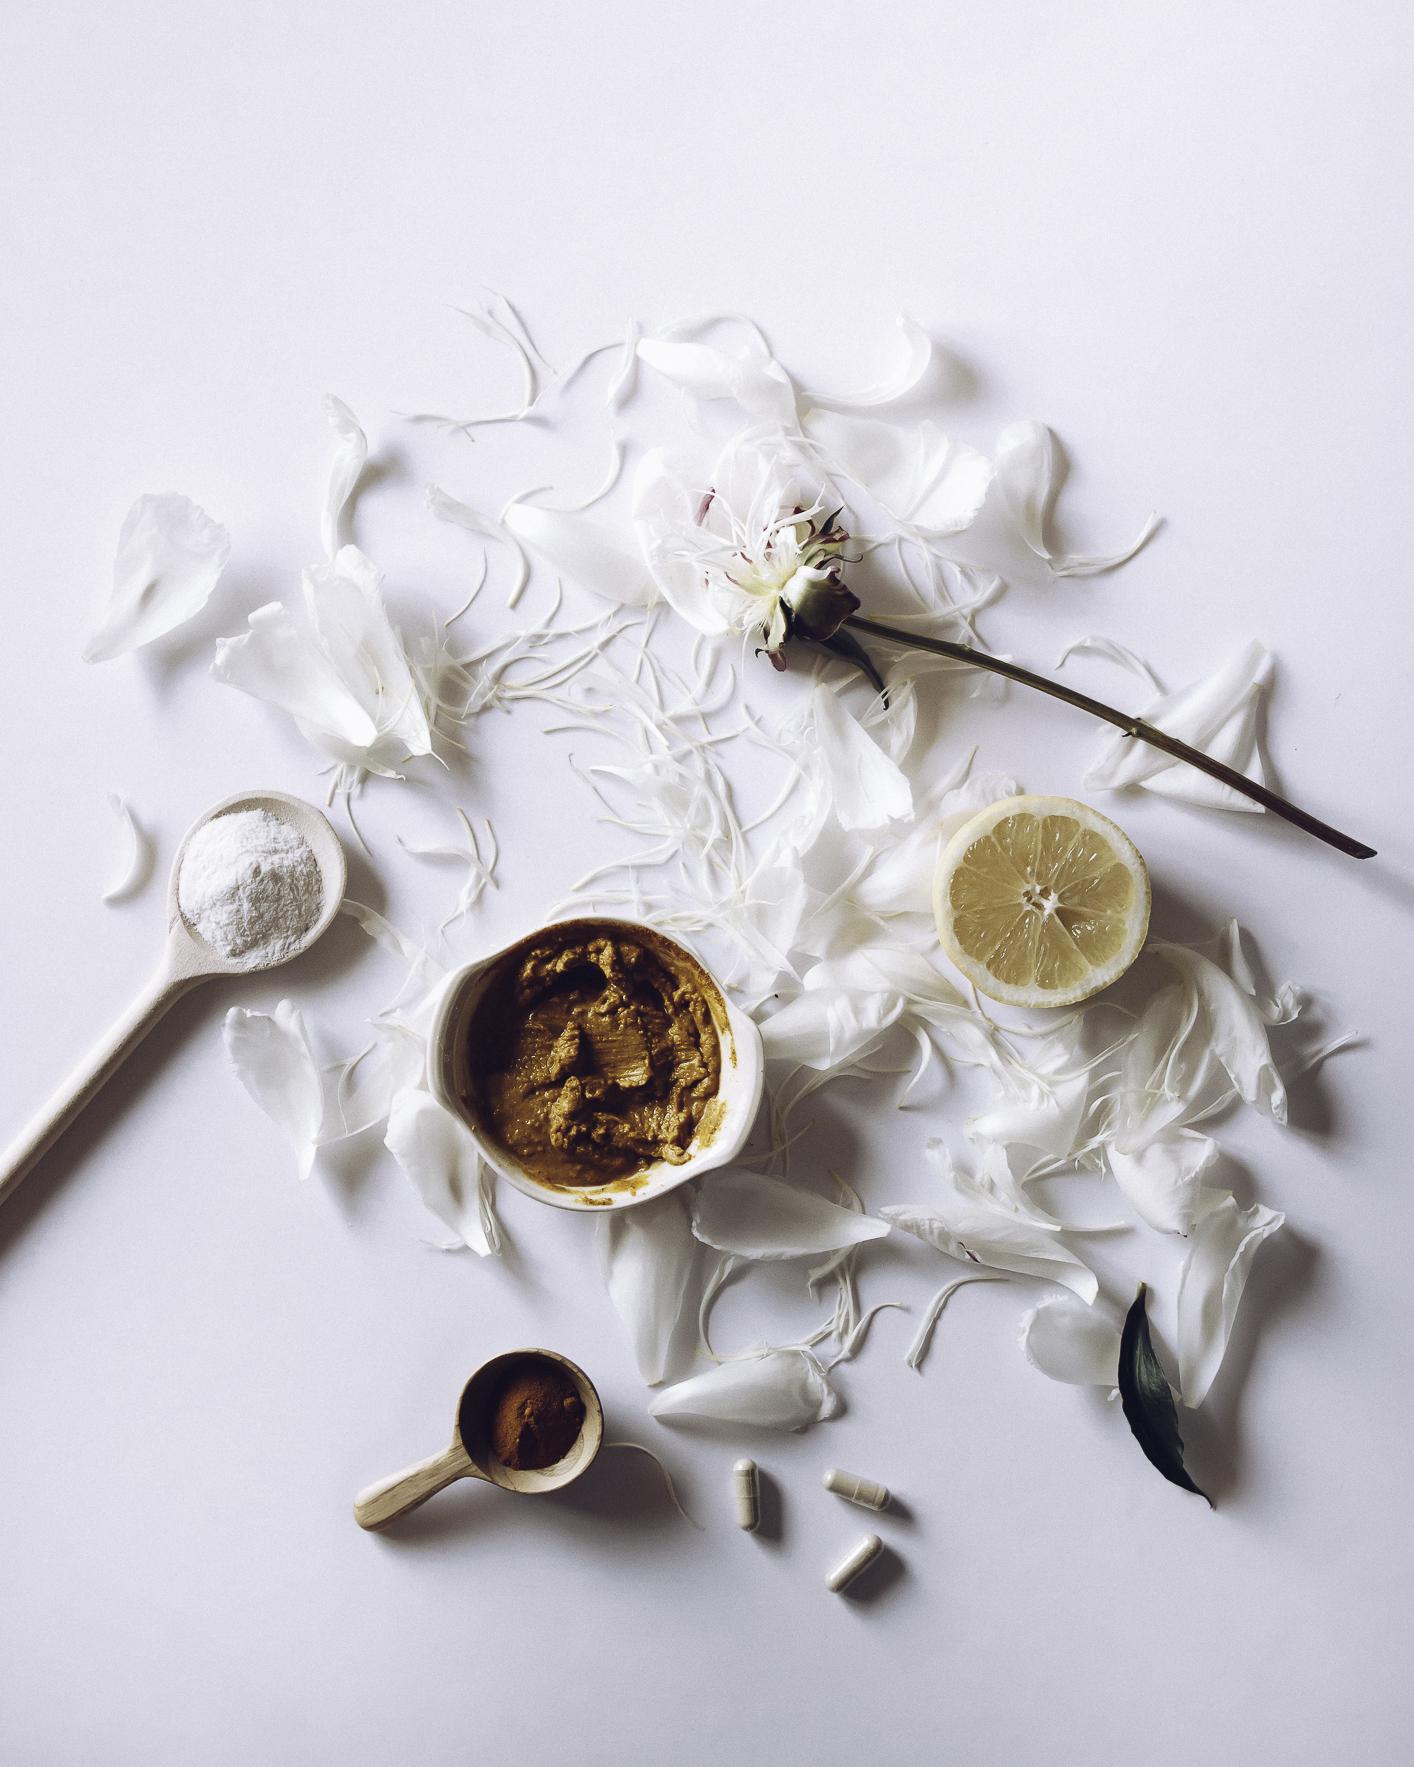 HELLOLOVELYLIVING.COM | DIY Turmeric Skin Lightening Mask | Ingredients